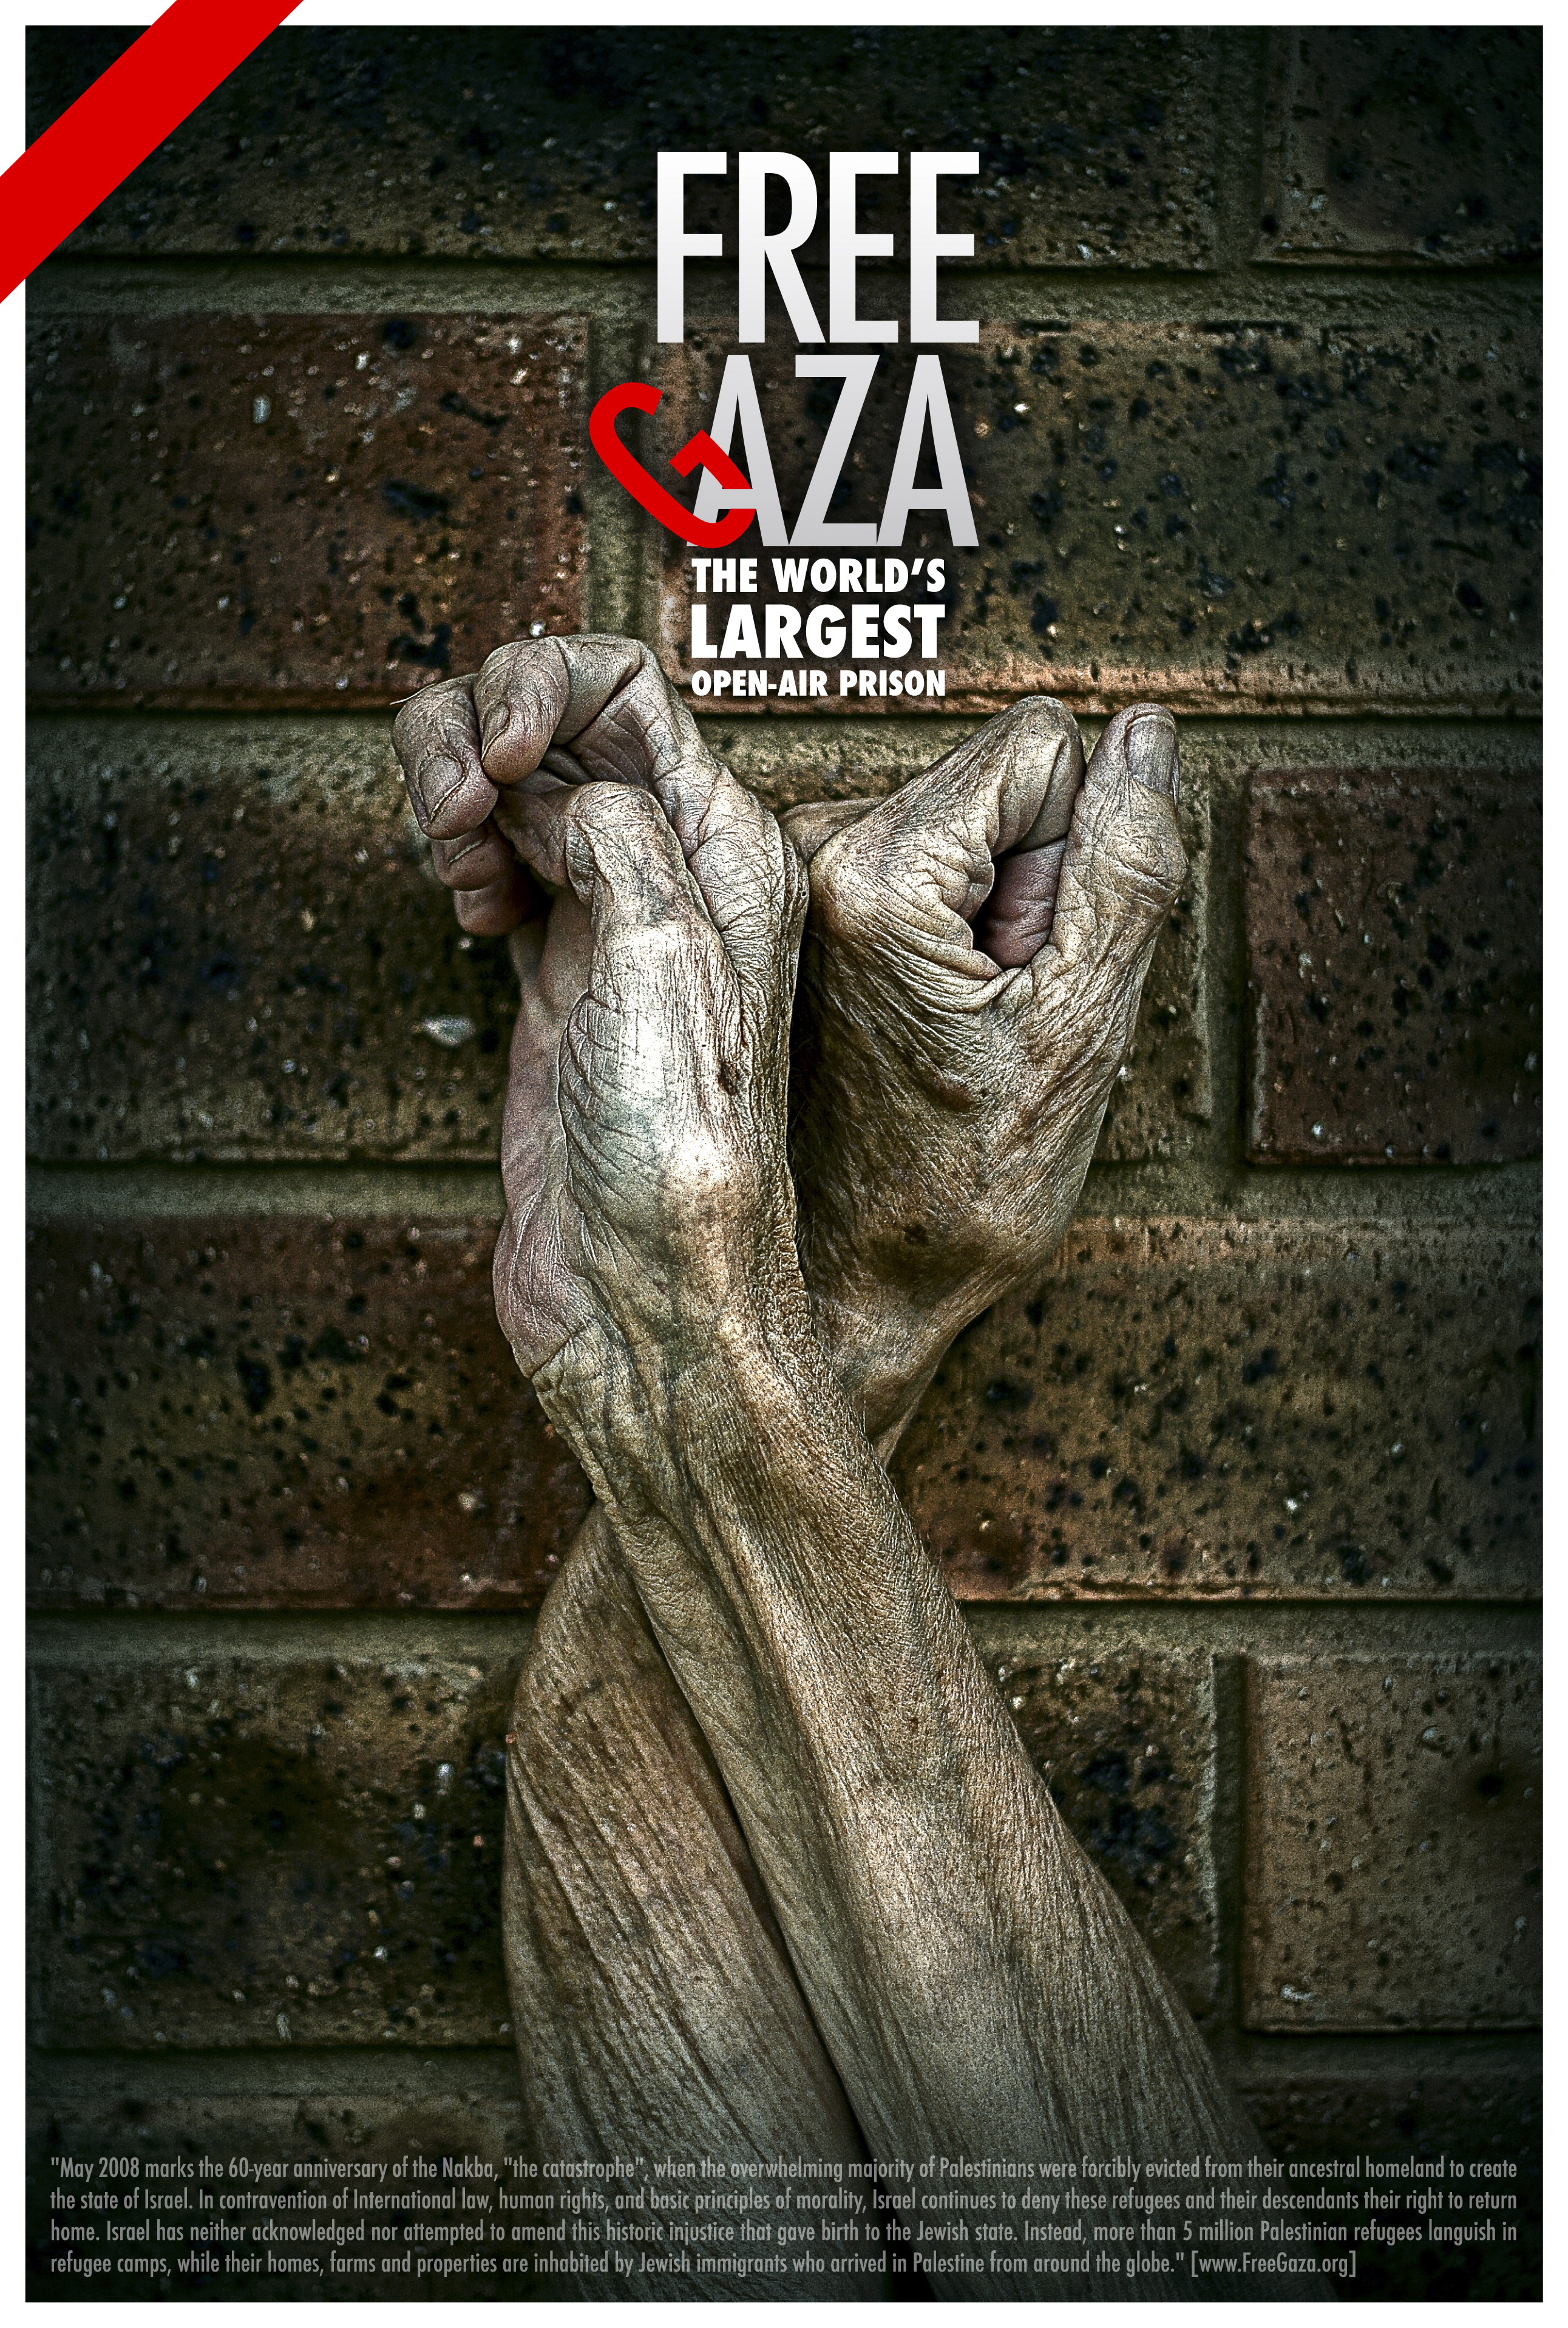 http://fc02.deviantart.net/fs41/f/2009/007/1/7/Free_Gaza___Part_2_by_Delt4.jpg